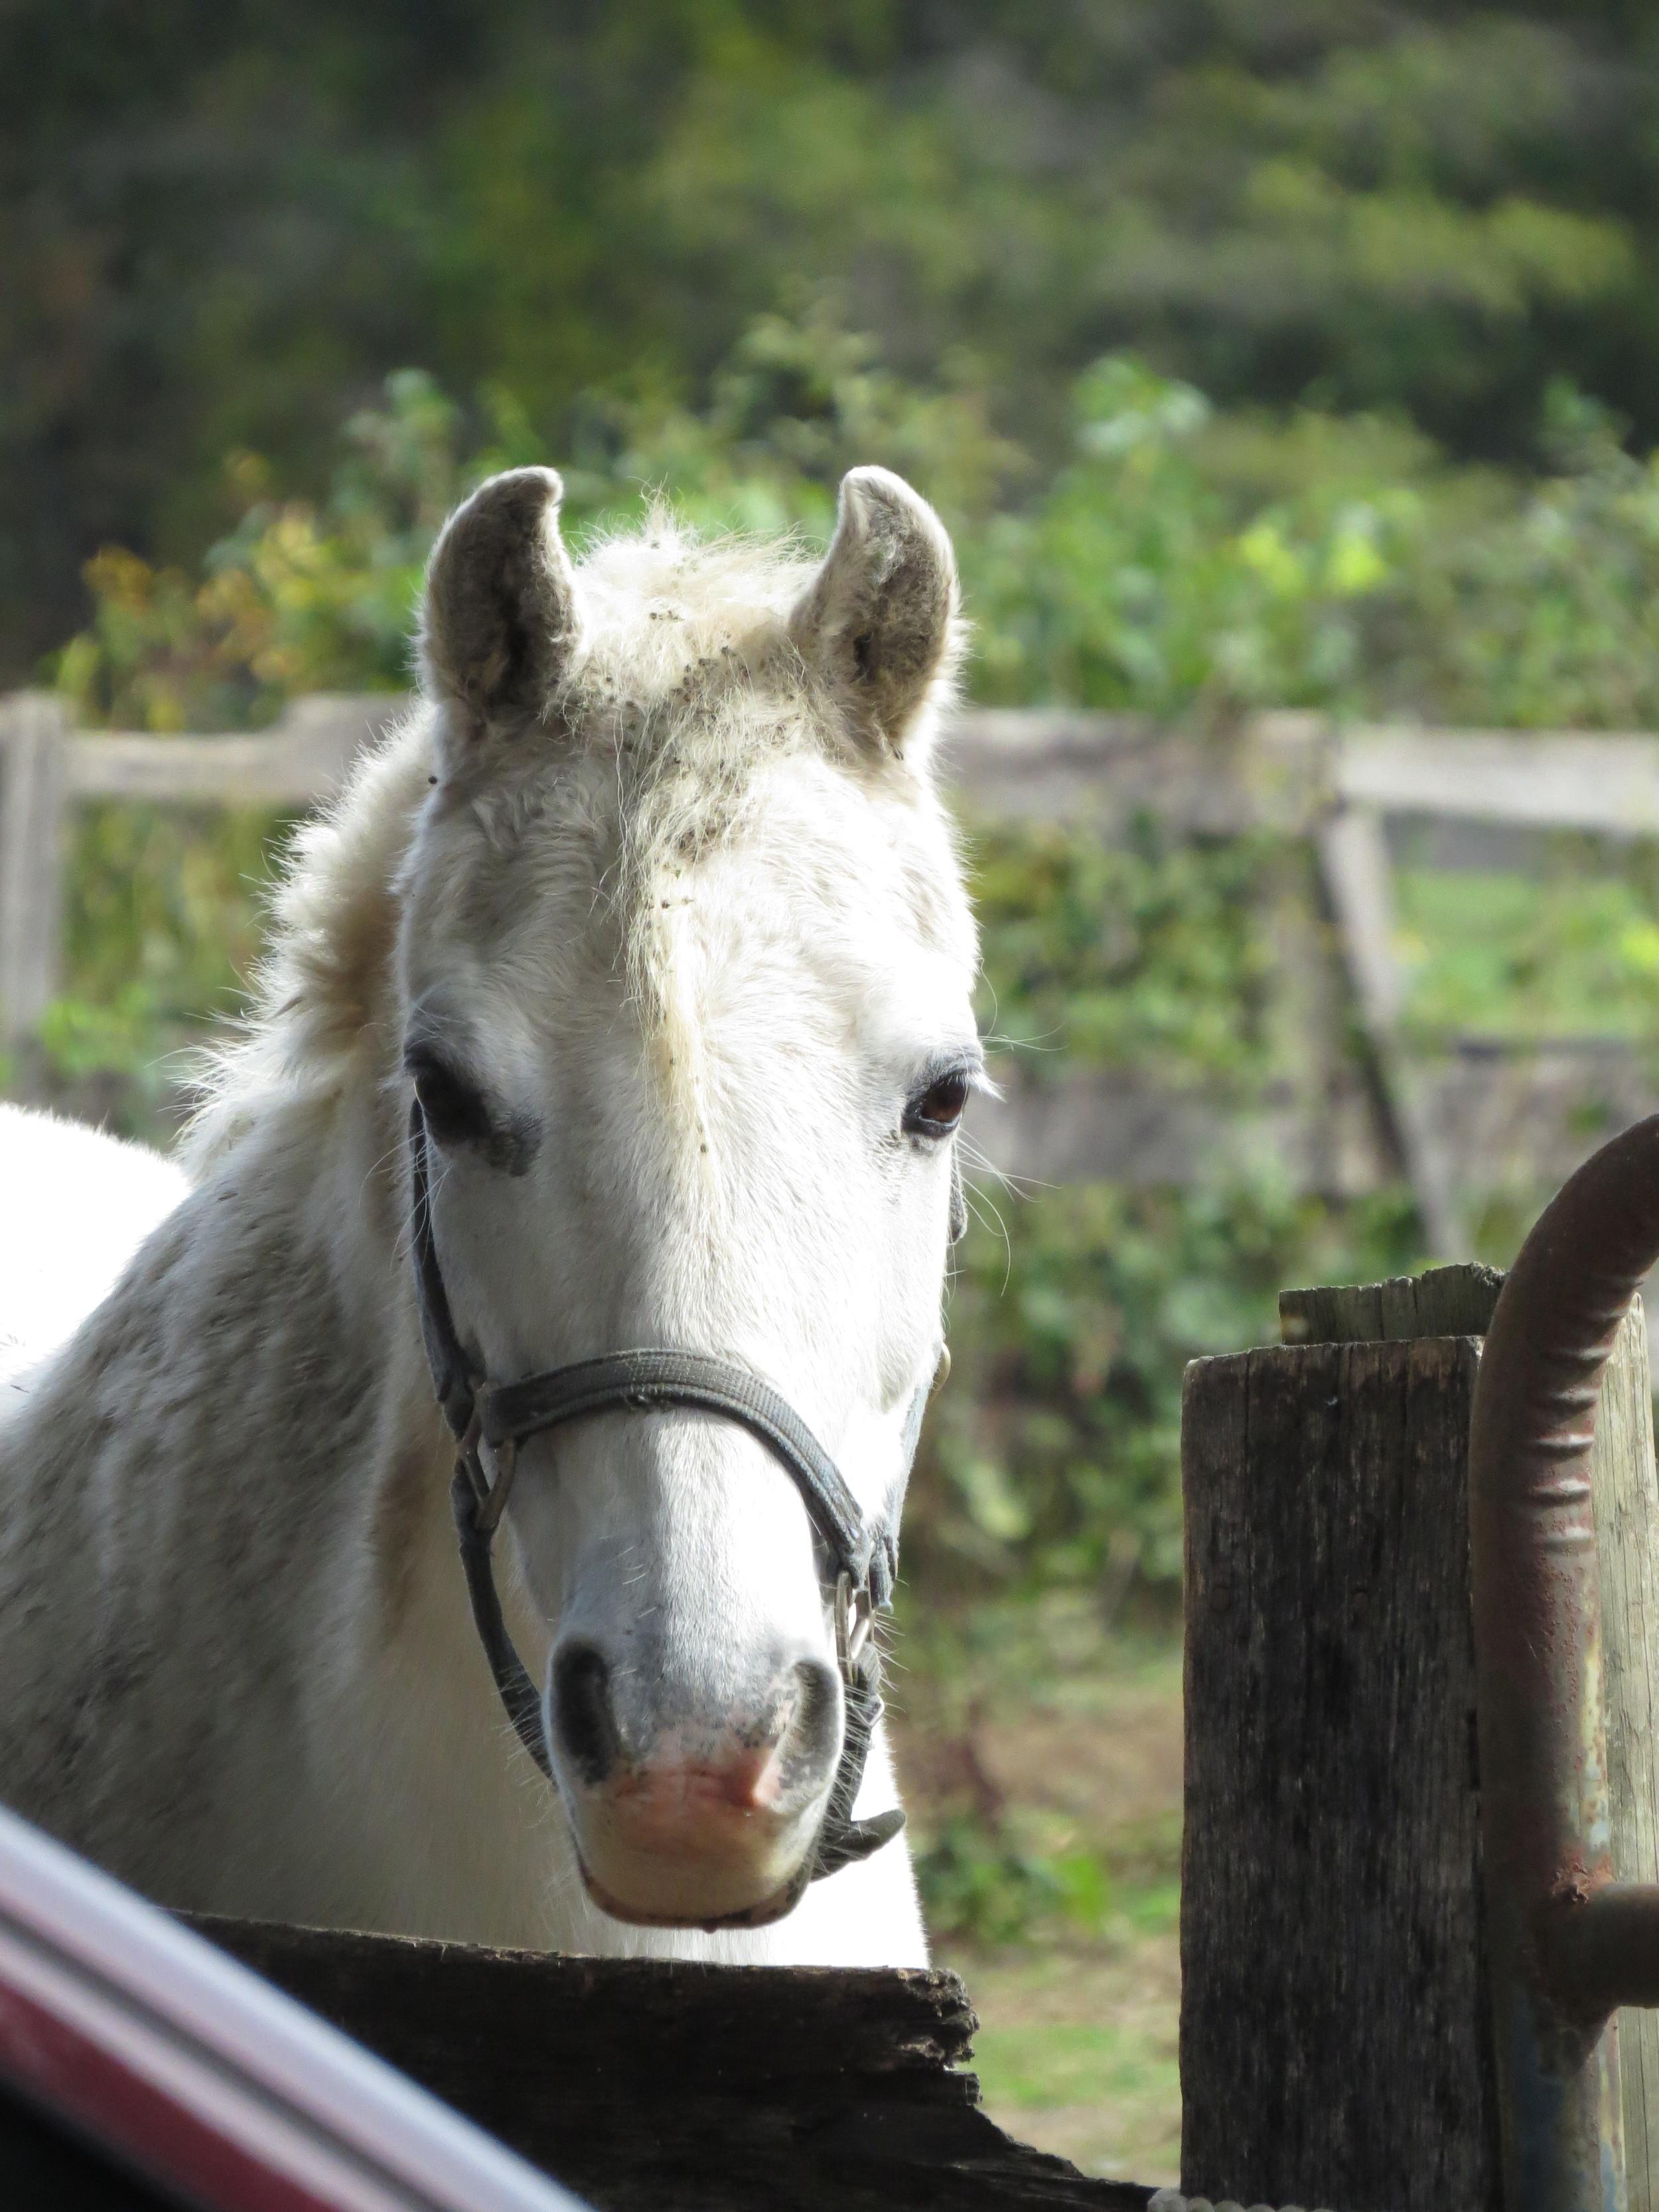 INTER-SCHOOL HORSE SHOW SERIES